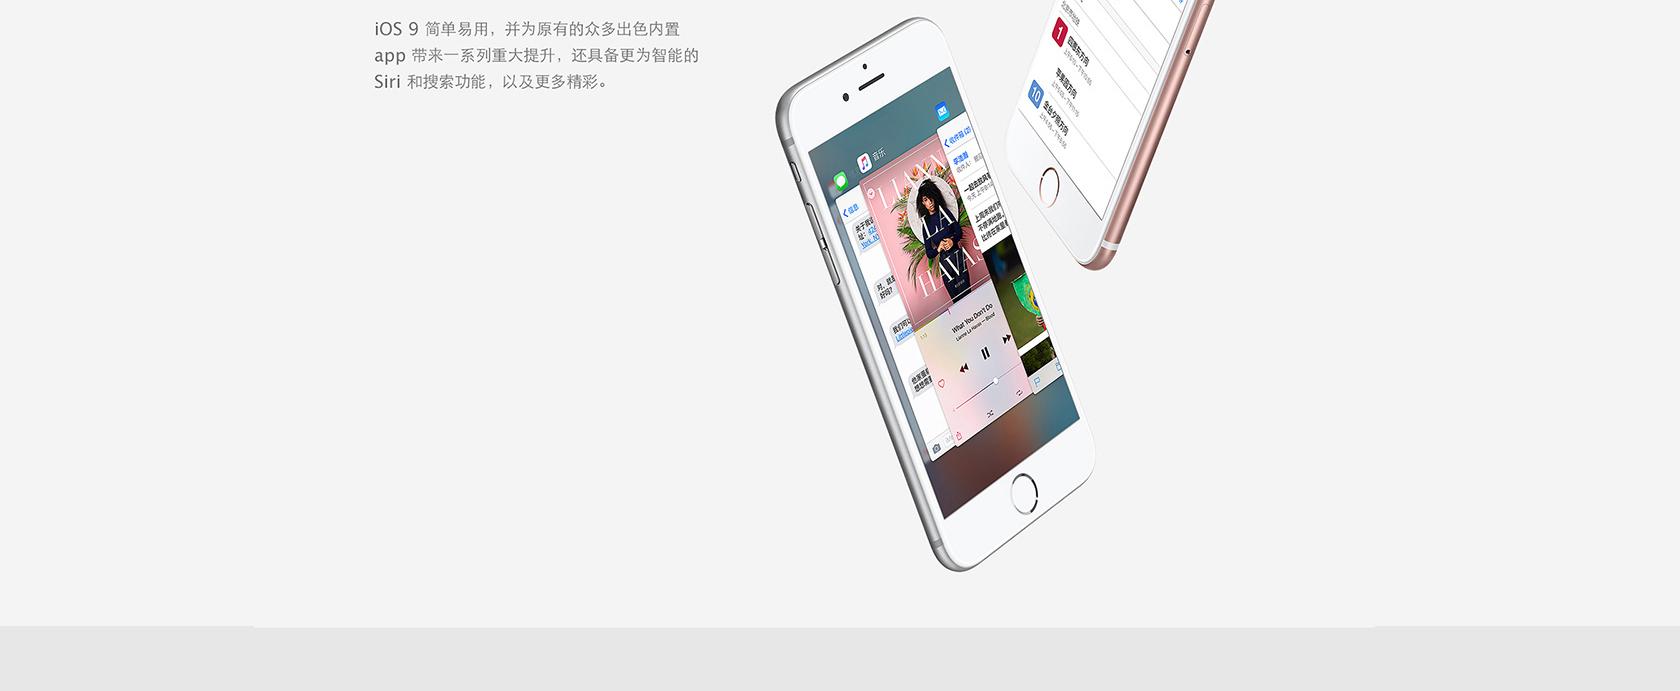 iphone iphone 6s